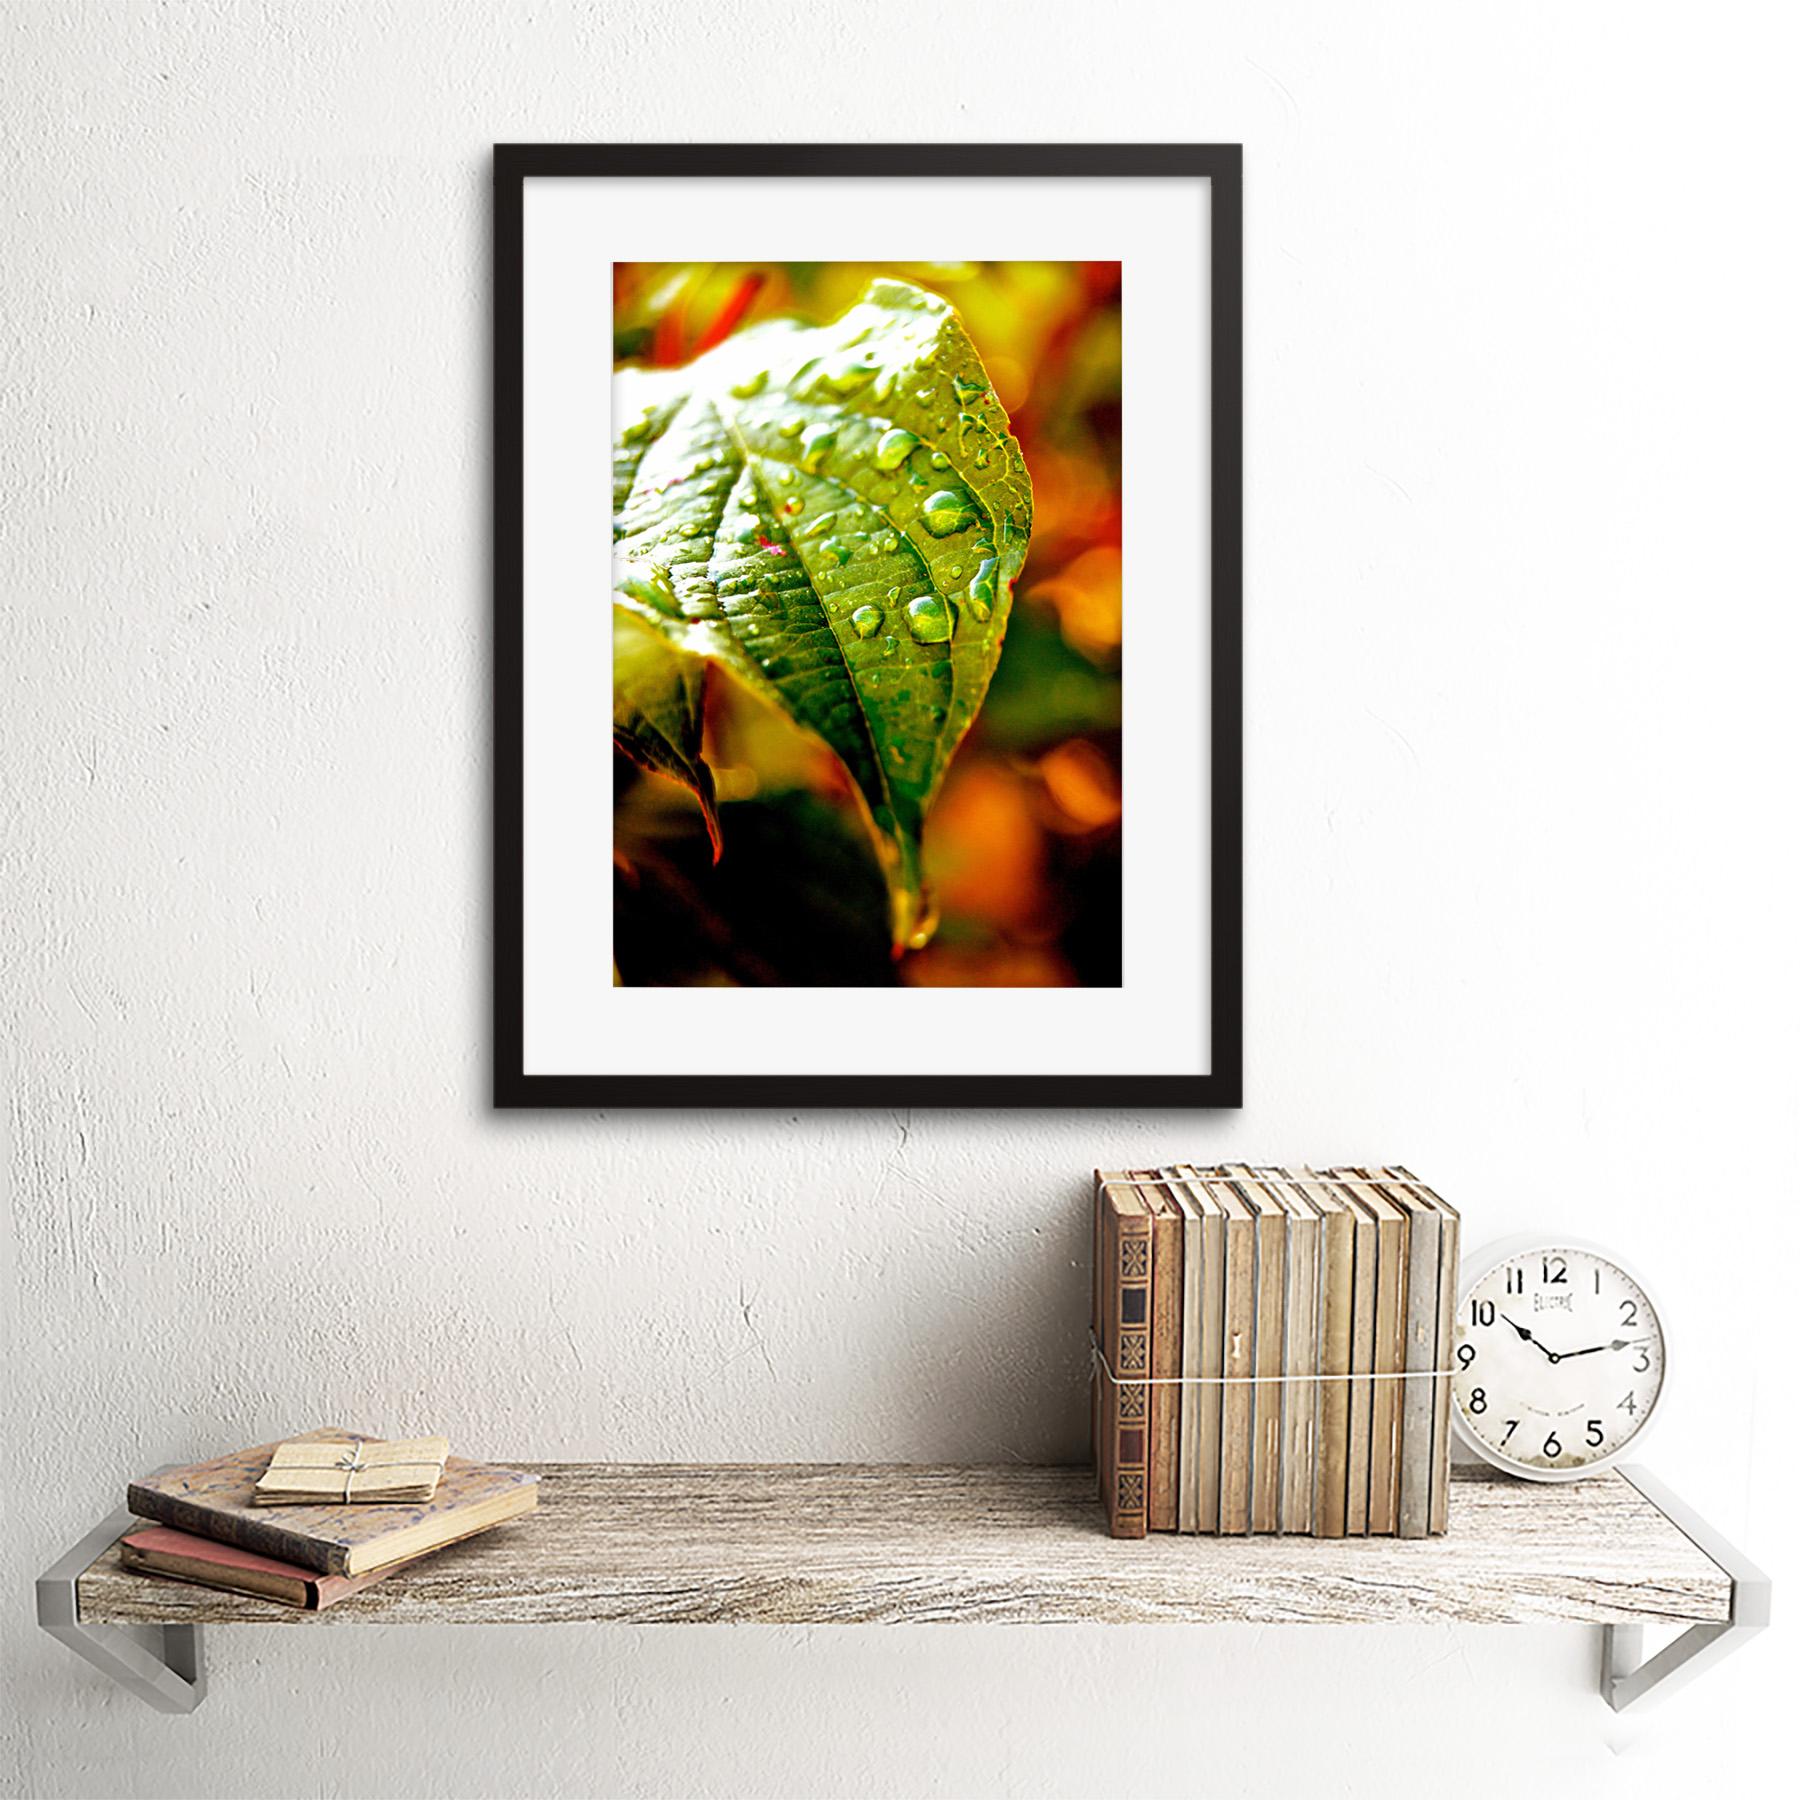 Photo-Leaf-Water-Drop-Green-Nature-Framed-Print-12x16-Inch miniatuur 3